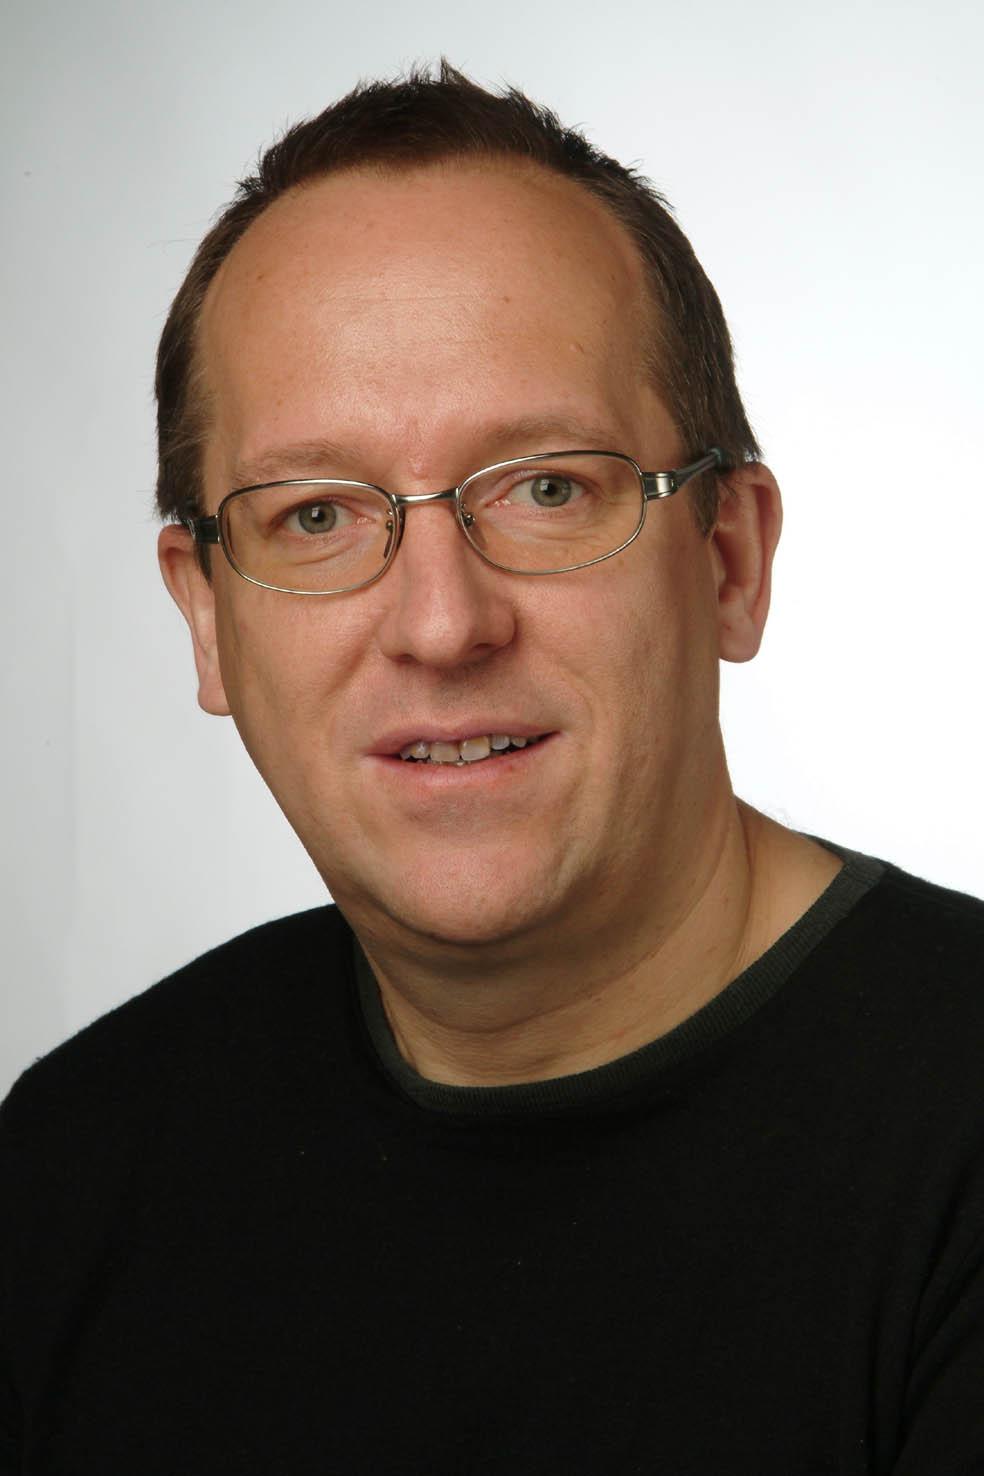 Frank Koenig